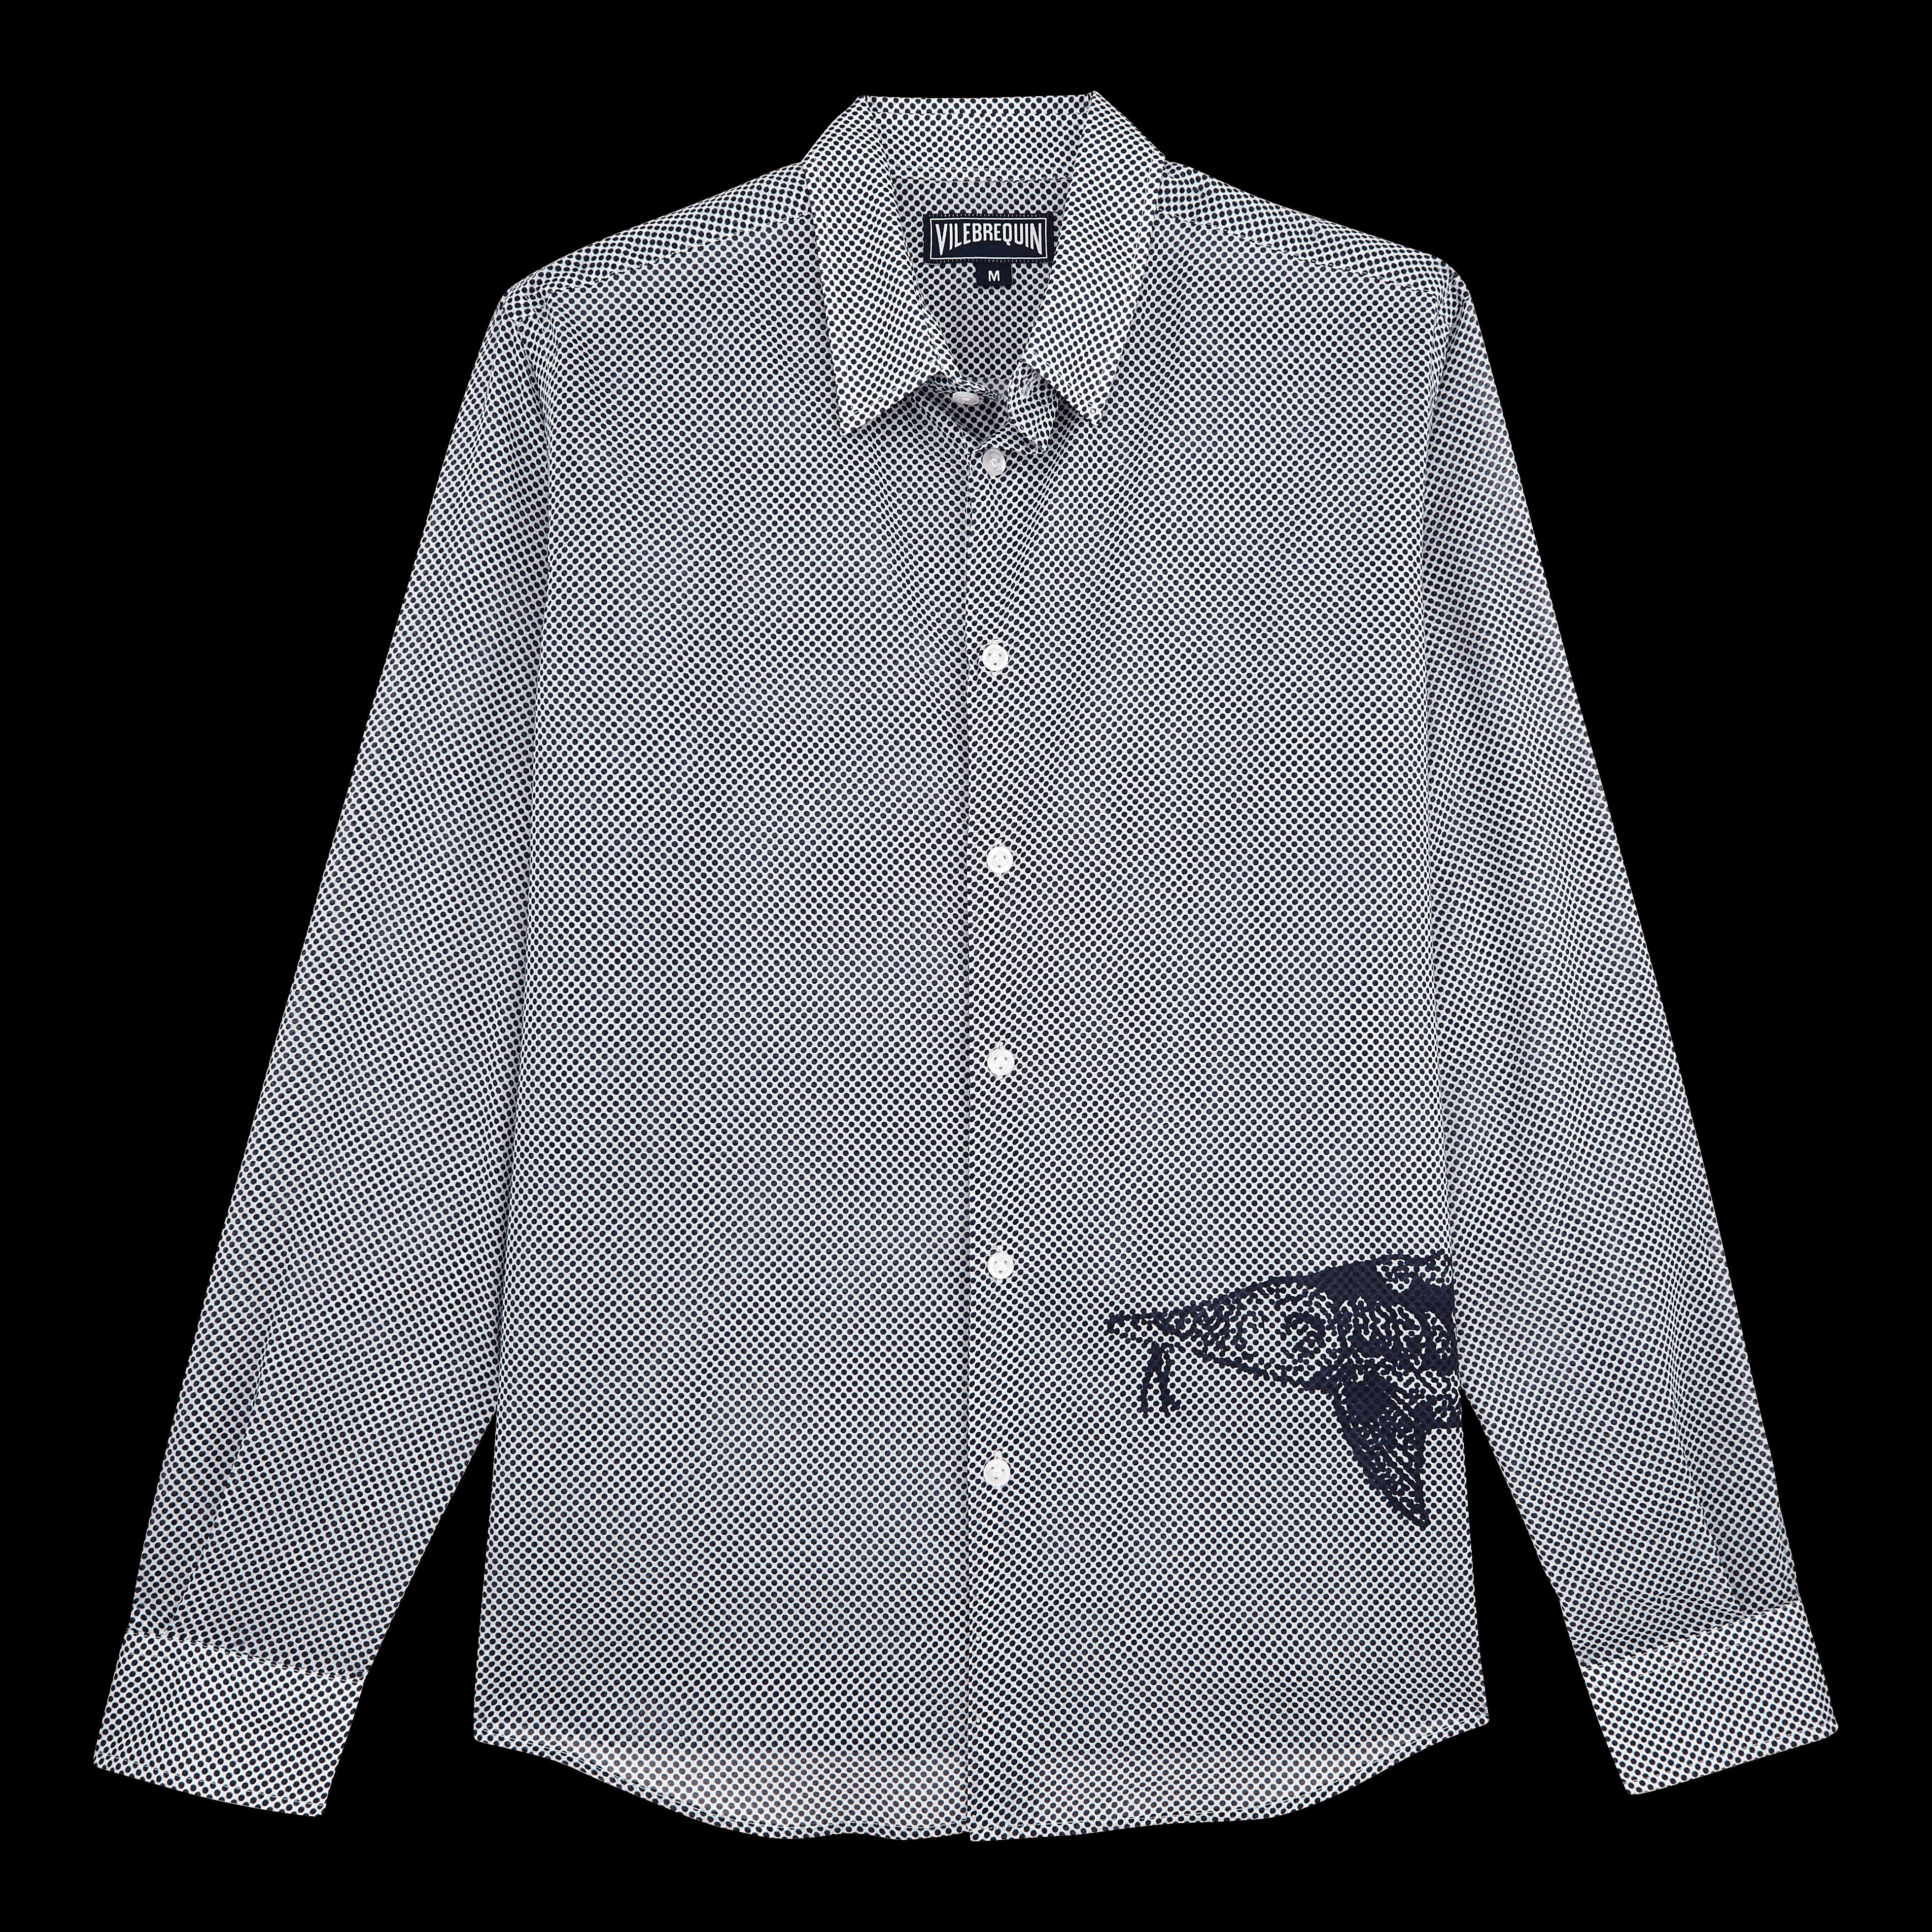 Vilebrequin Pap Unisexe Adulte - Unisex Cotton Voile Shirt Belle Ou Gars - Shirt - Caracal In White